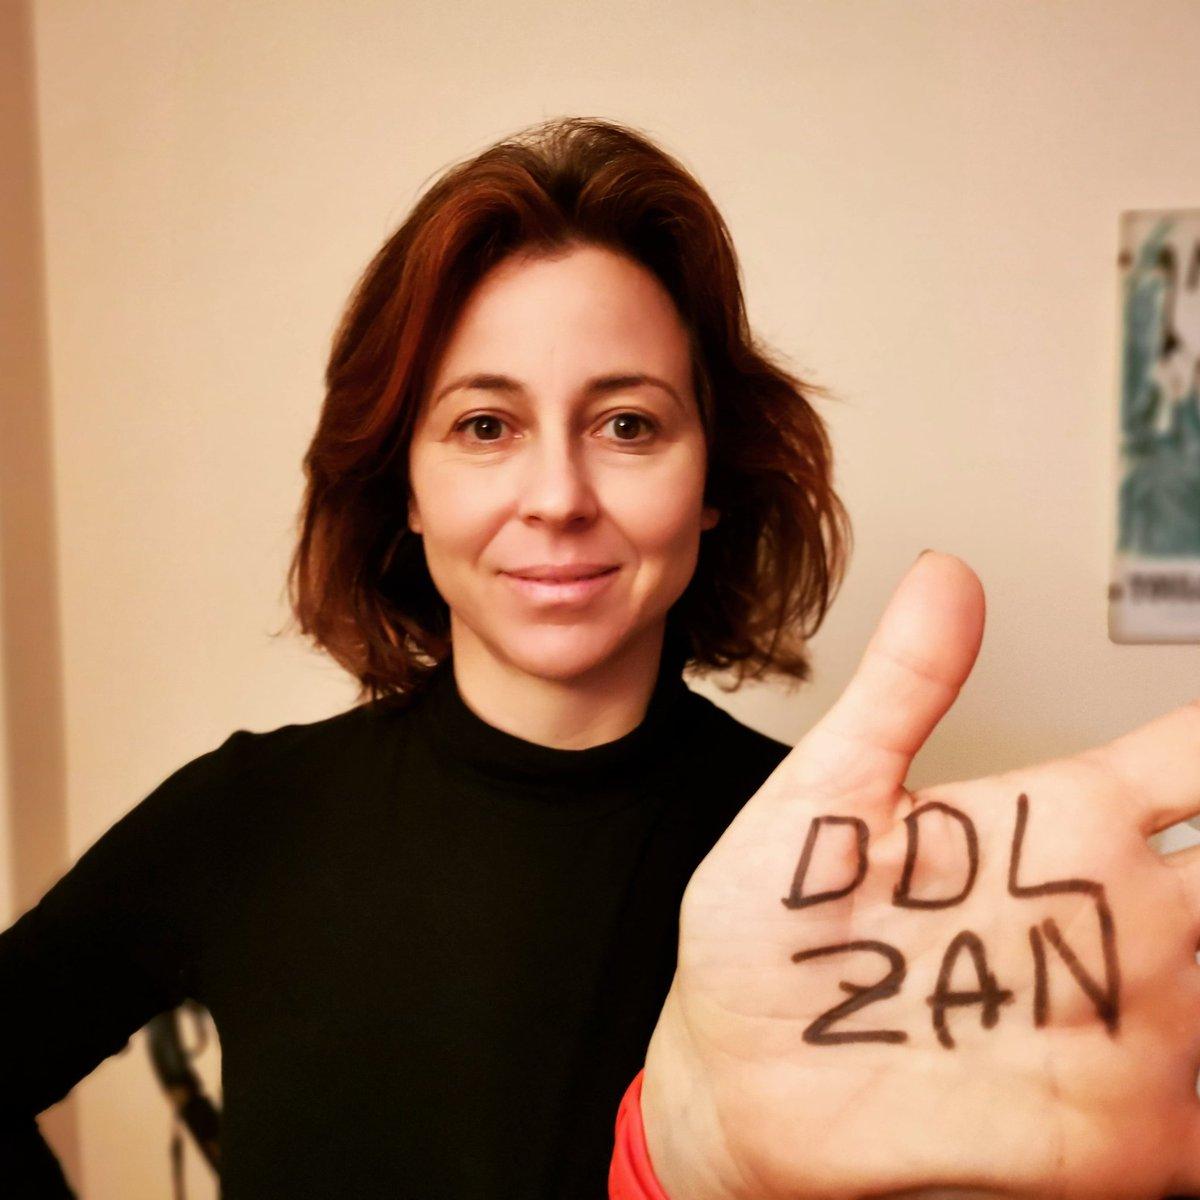 #DDLZan